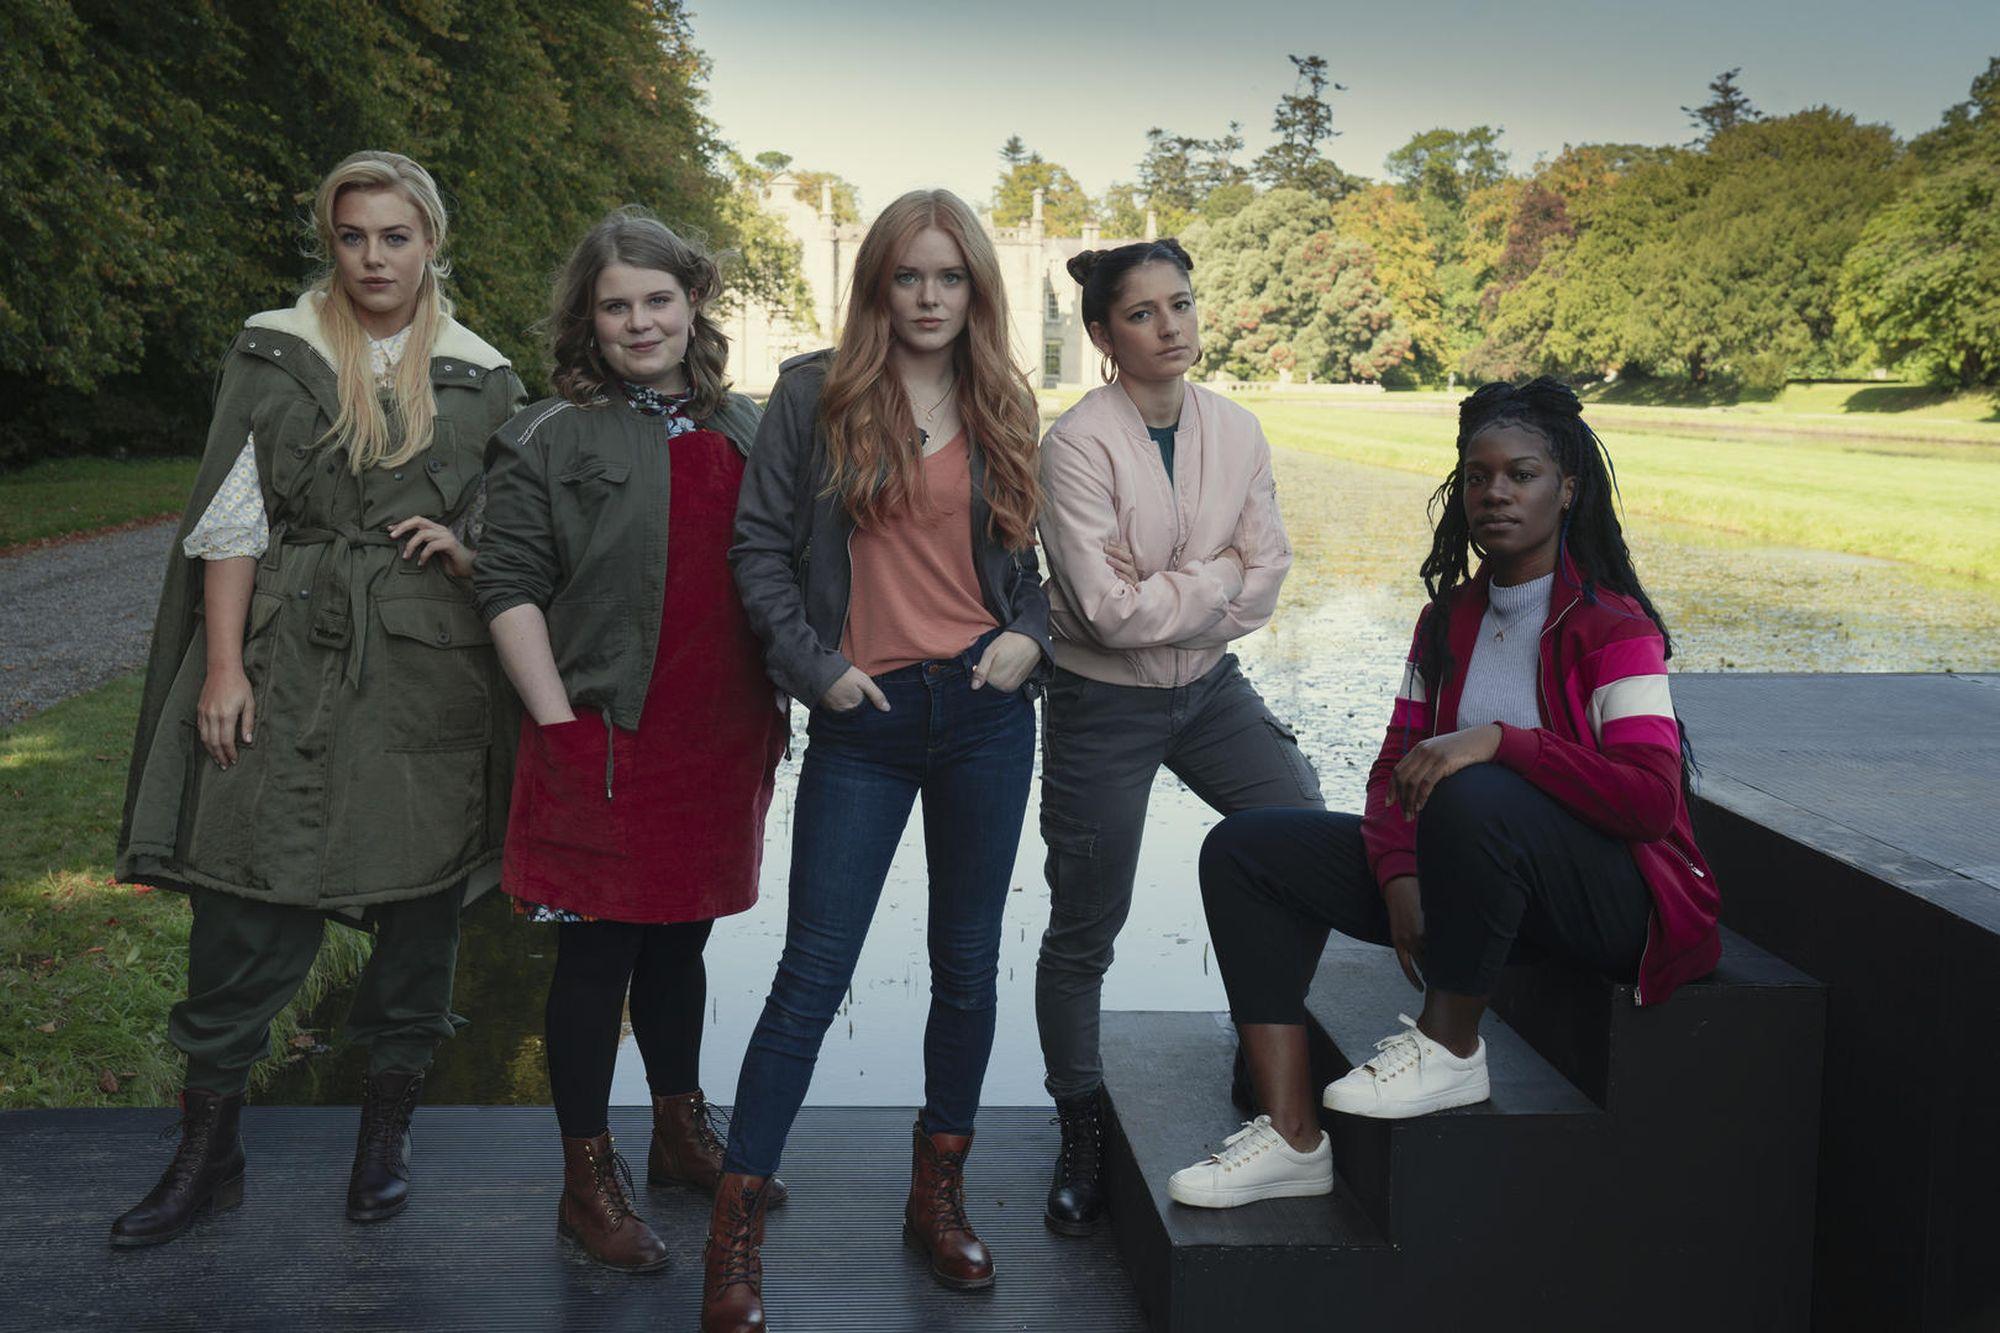 Fate The Winx Saga: uscita su Netflix, cast e trama